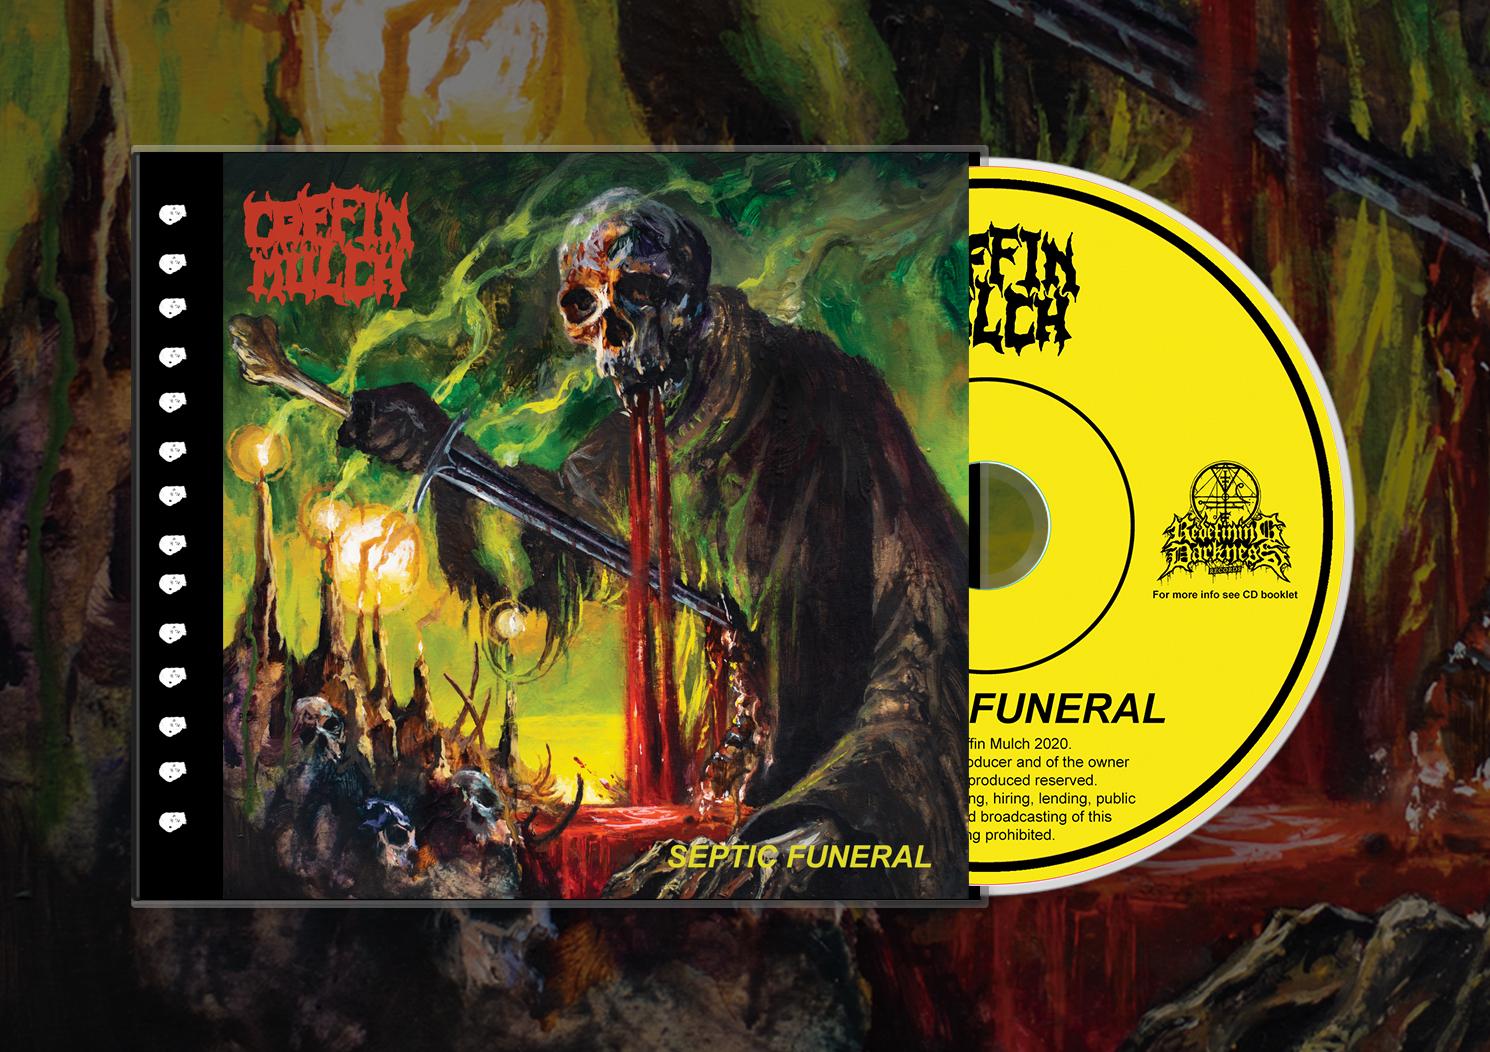 COFFIN MULCH - Septic Funeral